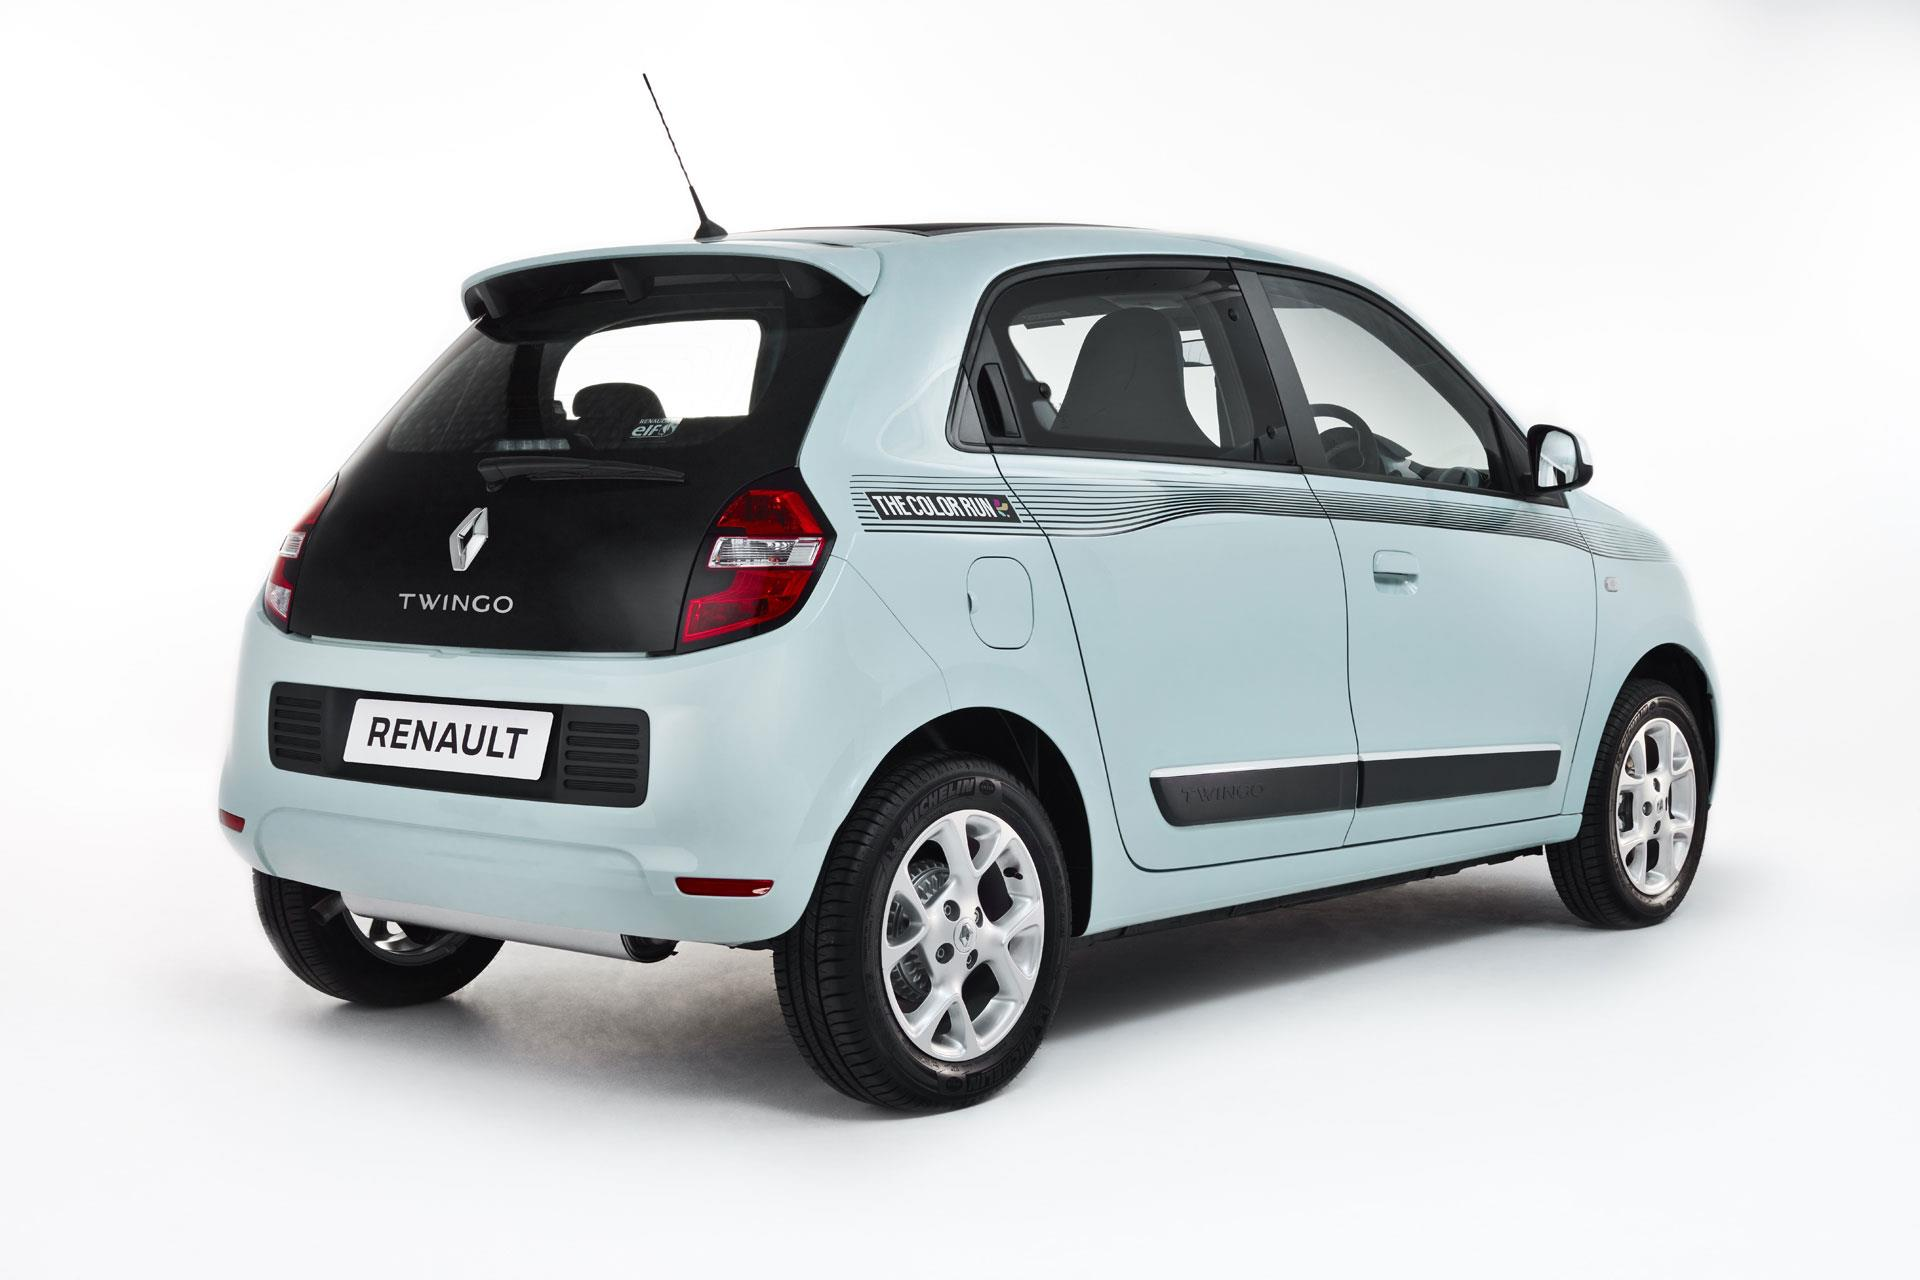 Renault Alaskan Price >> 2016 Renault Twingo Special Edition Image